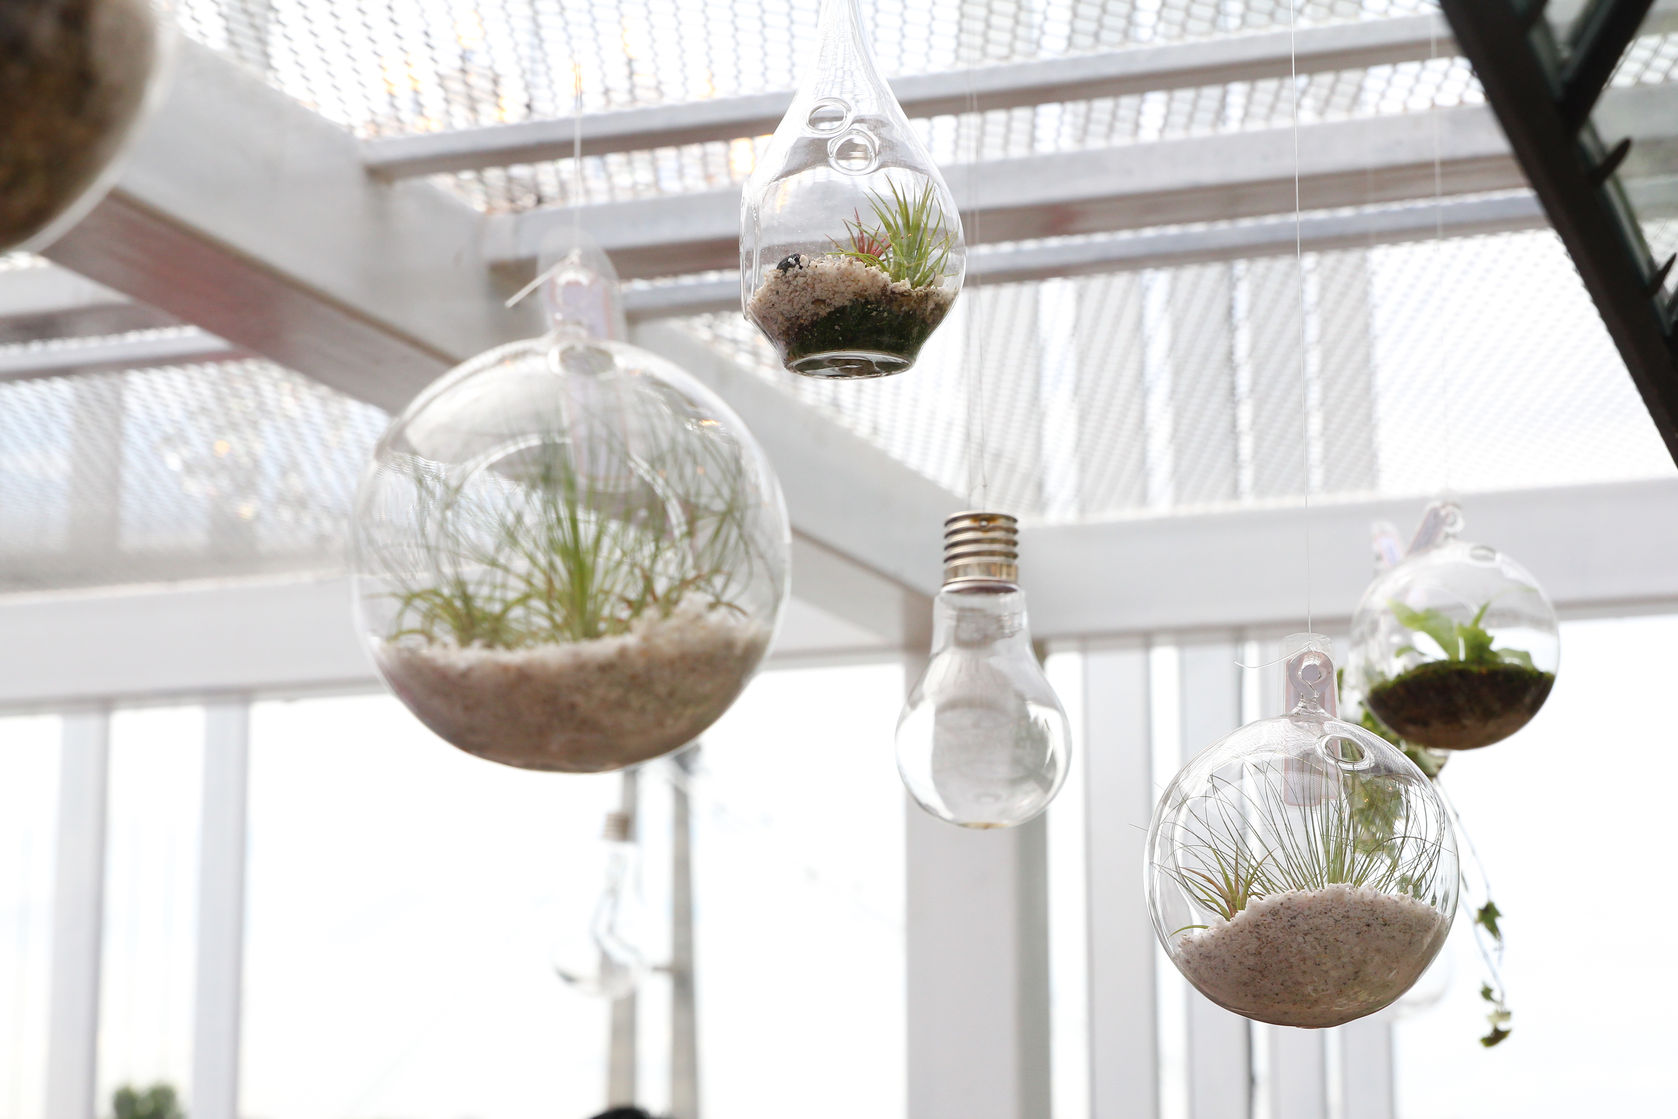 Fun With Plants How To Make A Terrarium